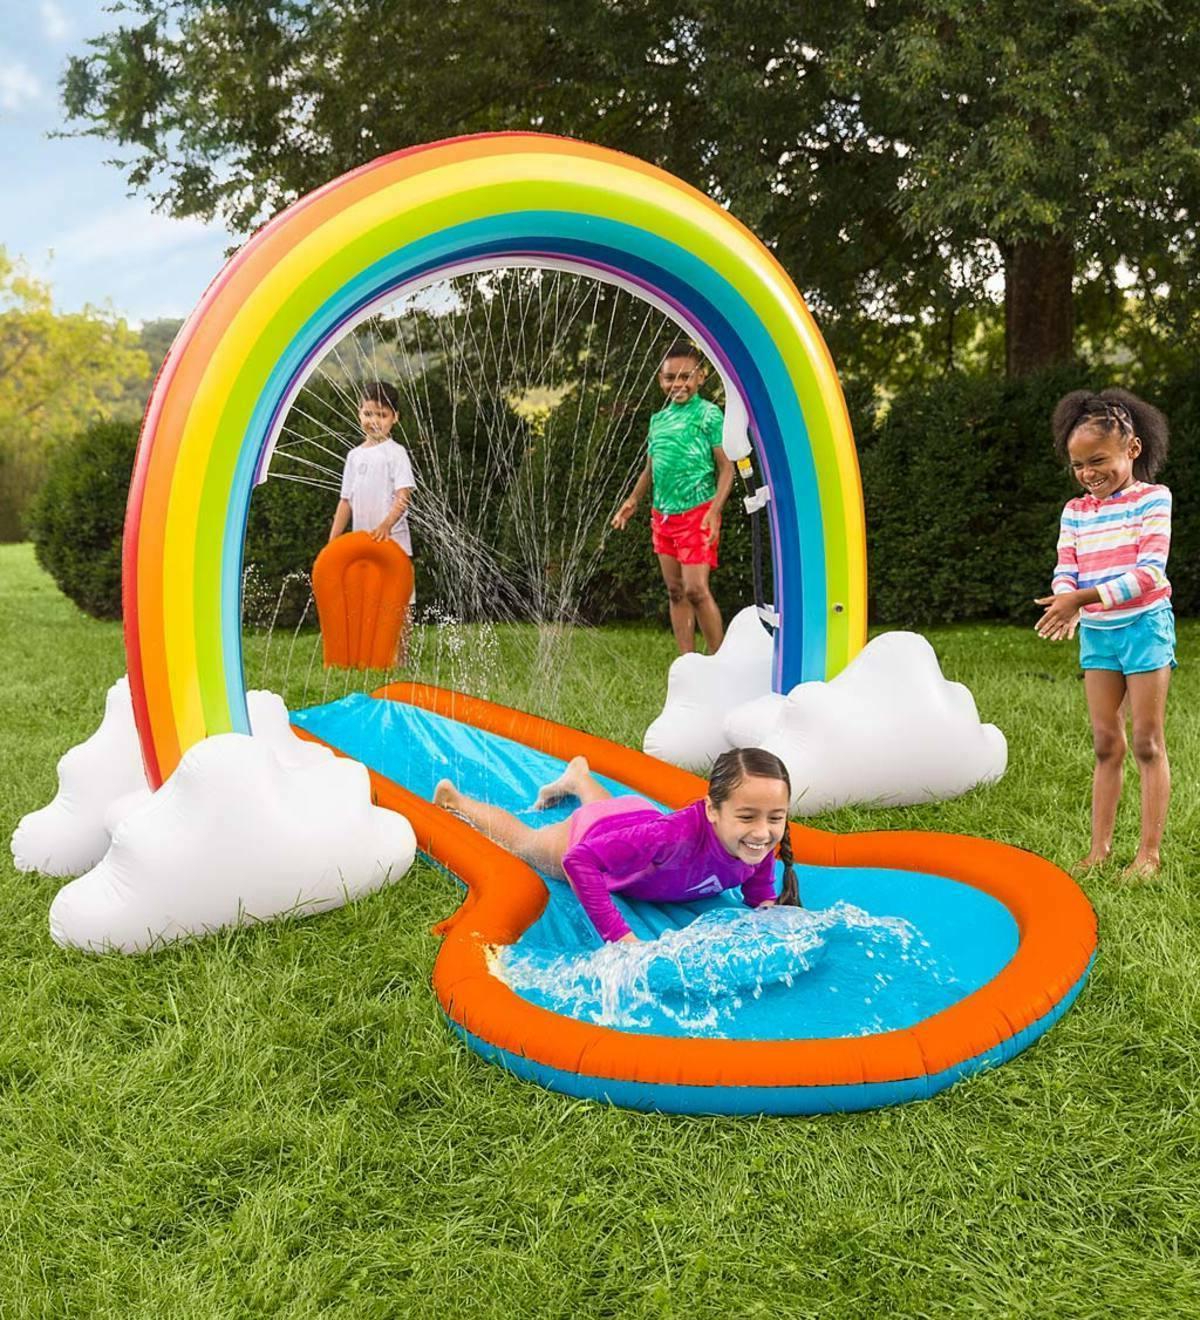 Inflatable Two Landing Lawn Fun